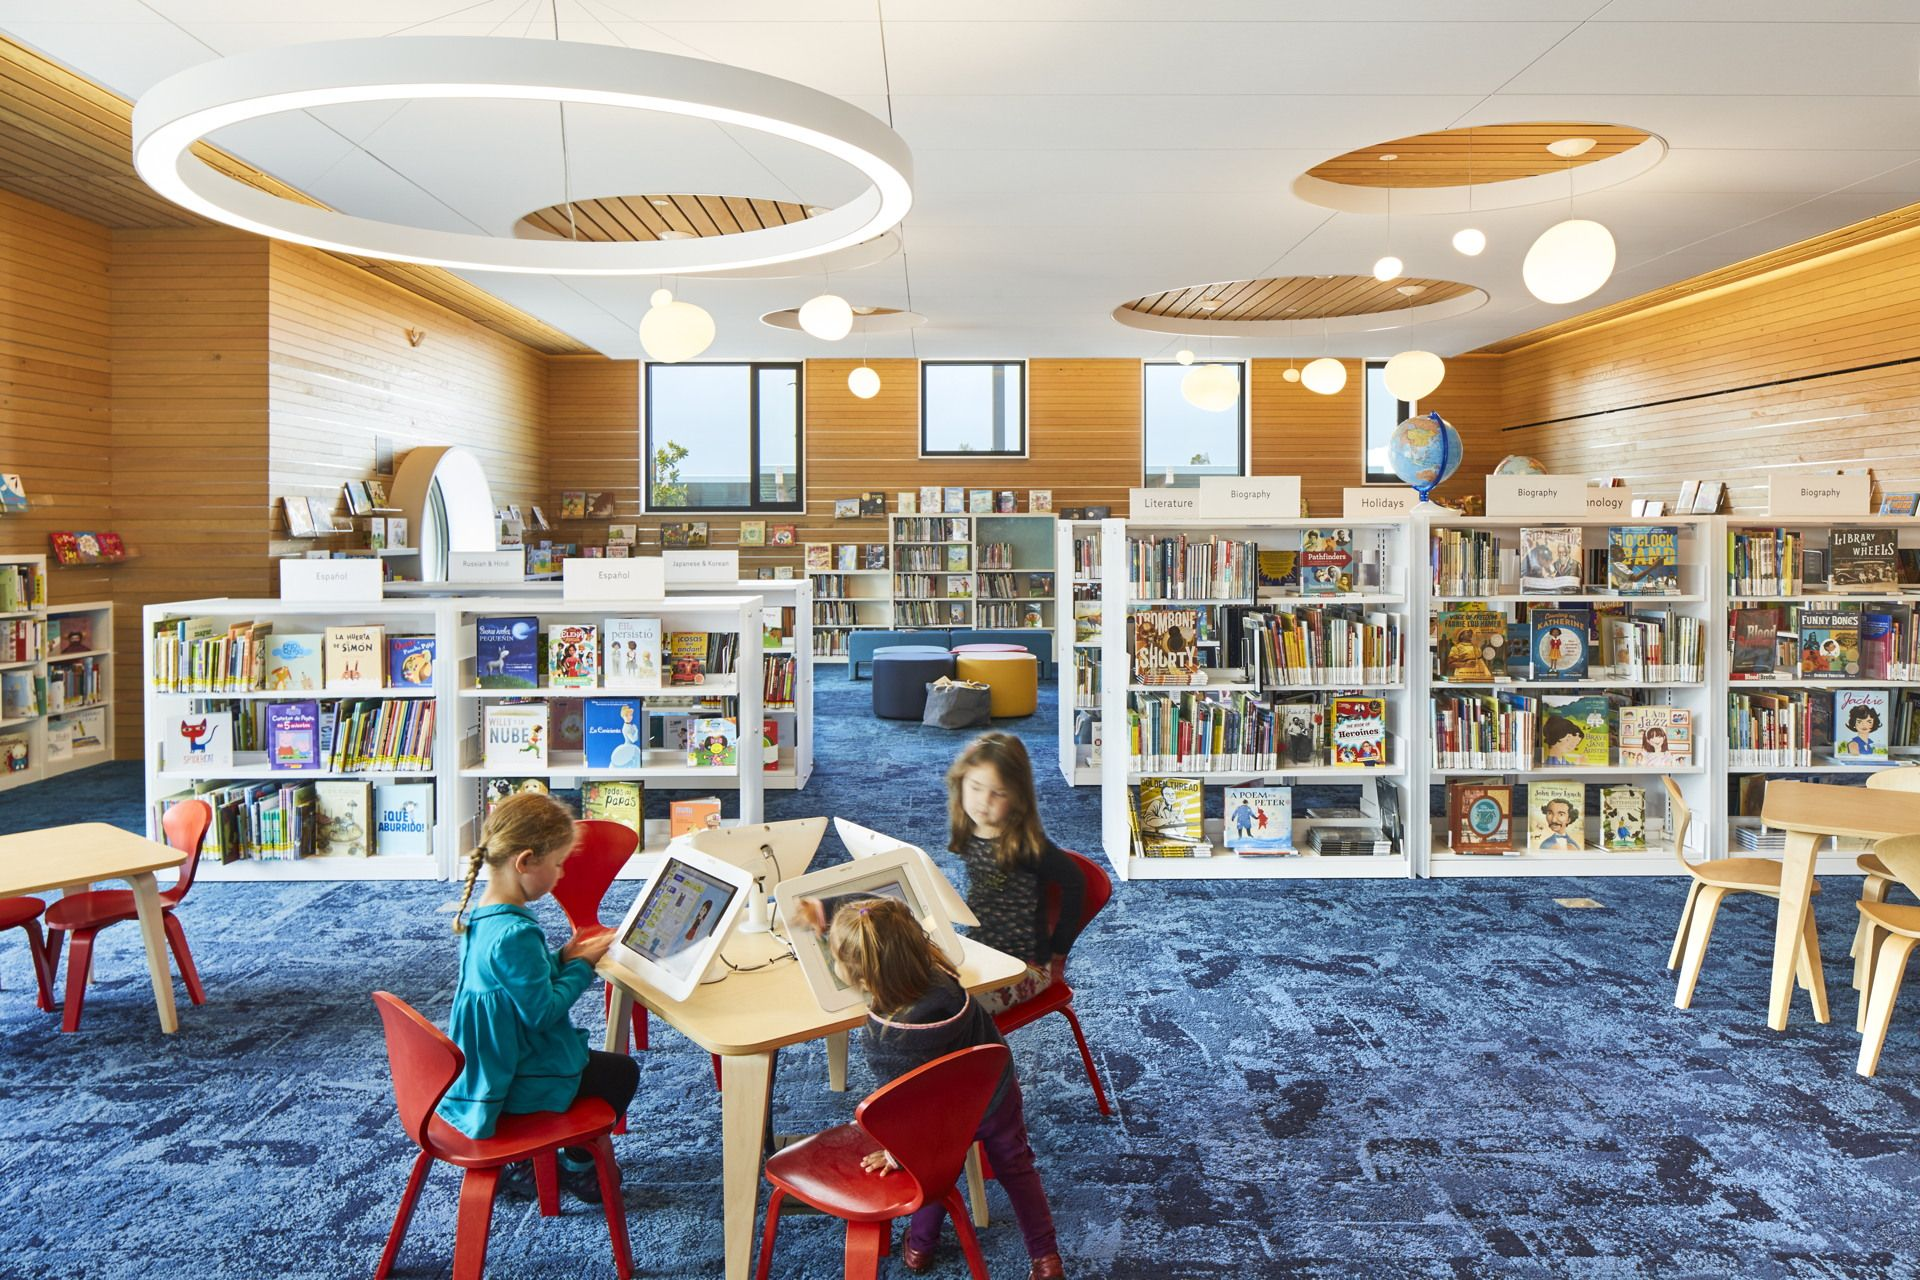 The Multiawardwinning Half Moon Bay Library By Noll Tam Architects Livegreenblog Half Moon Bay Interior Architect Library Design